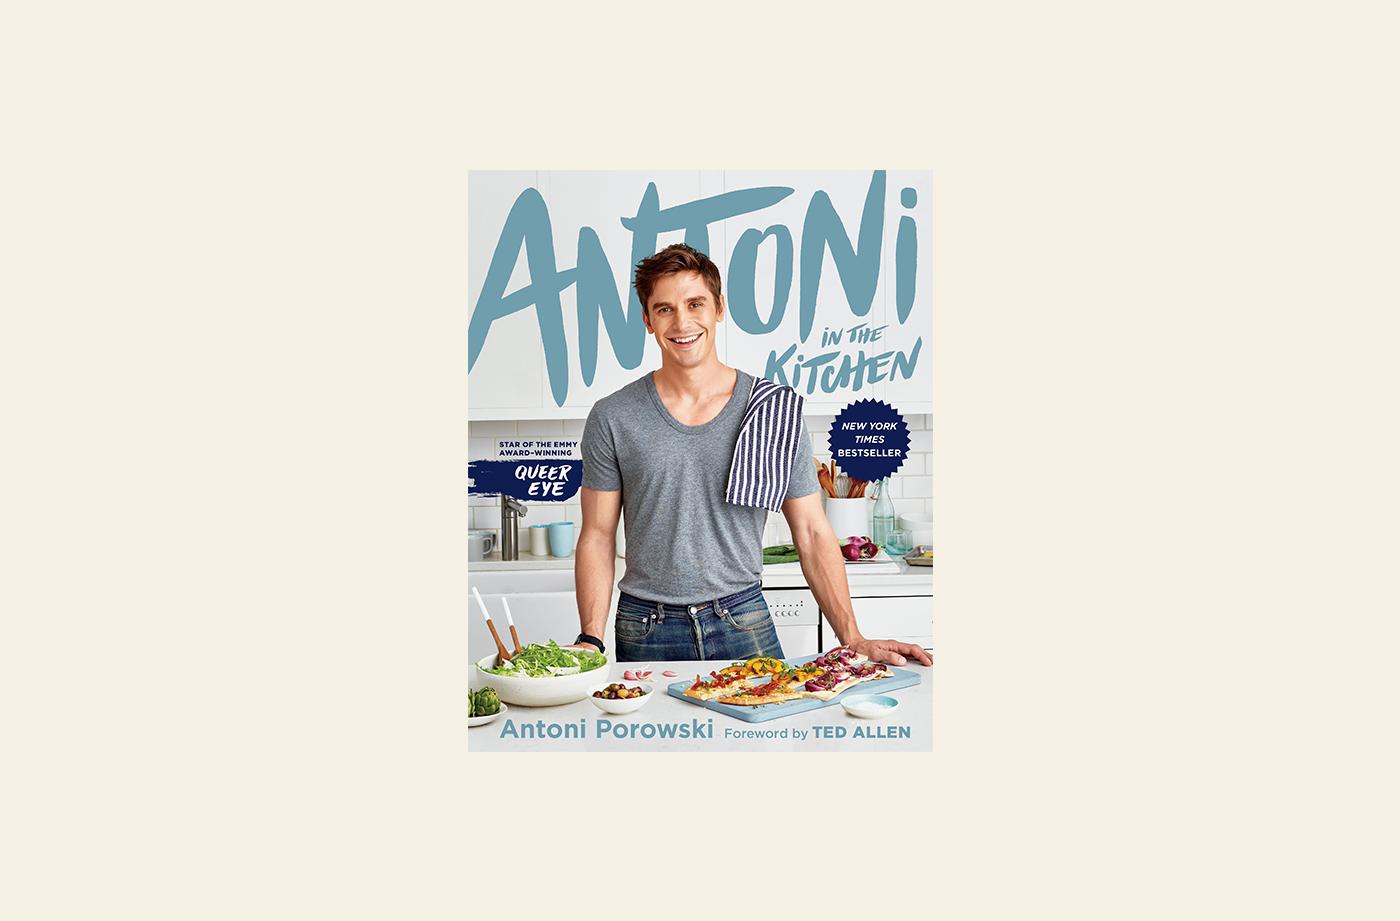 antoni in the kitchen cookbook